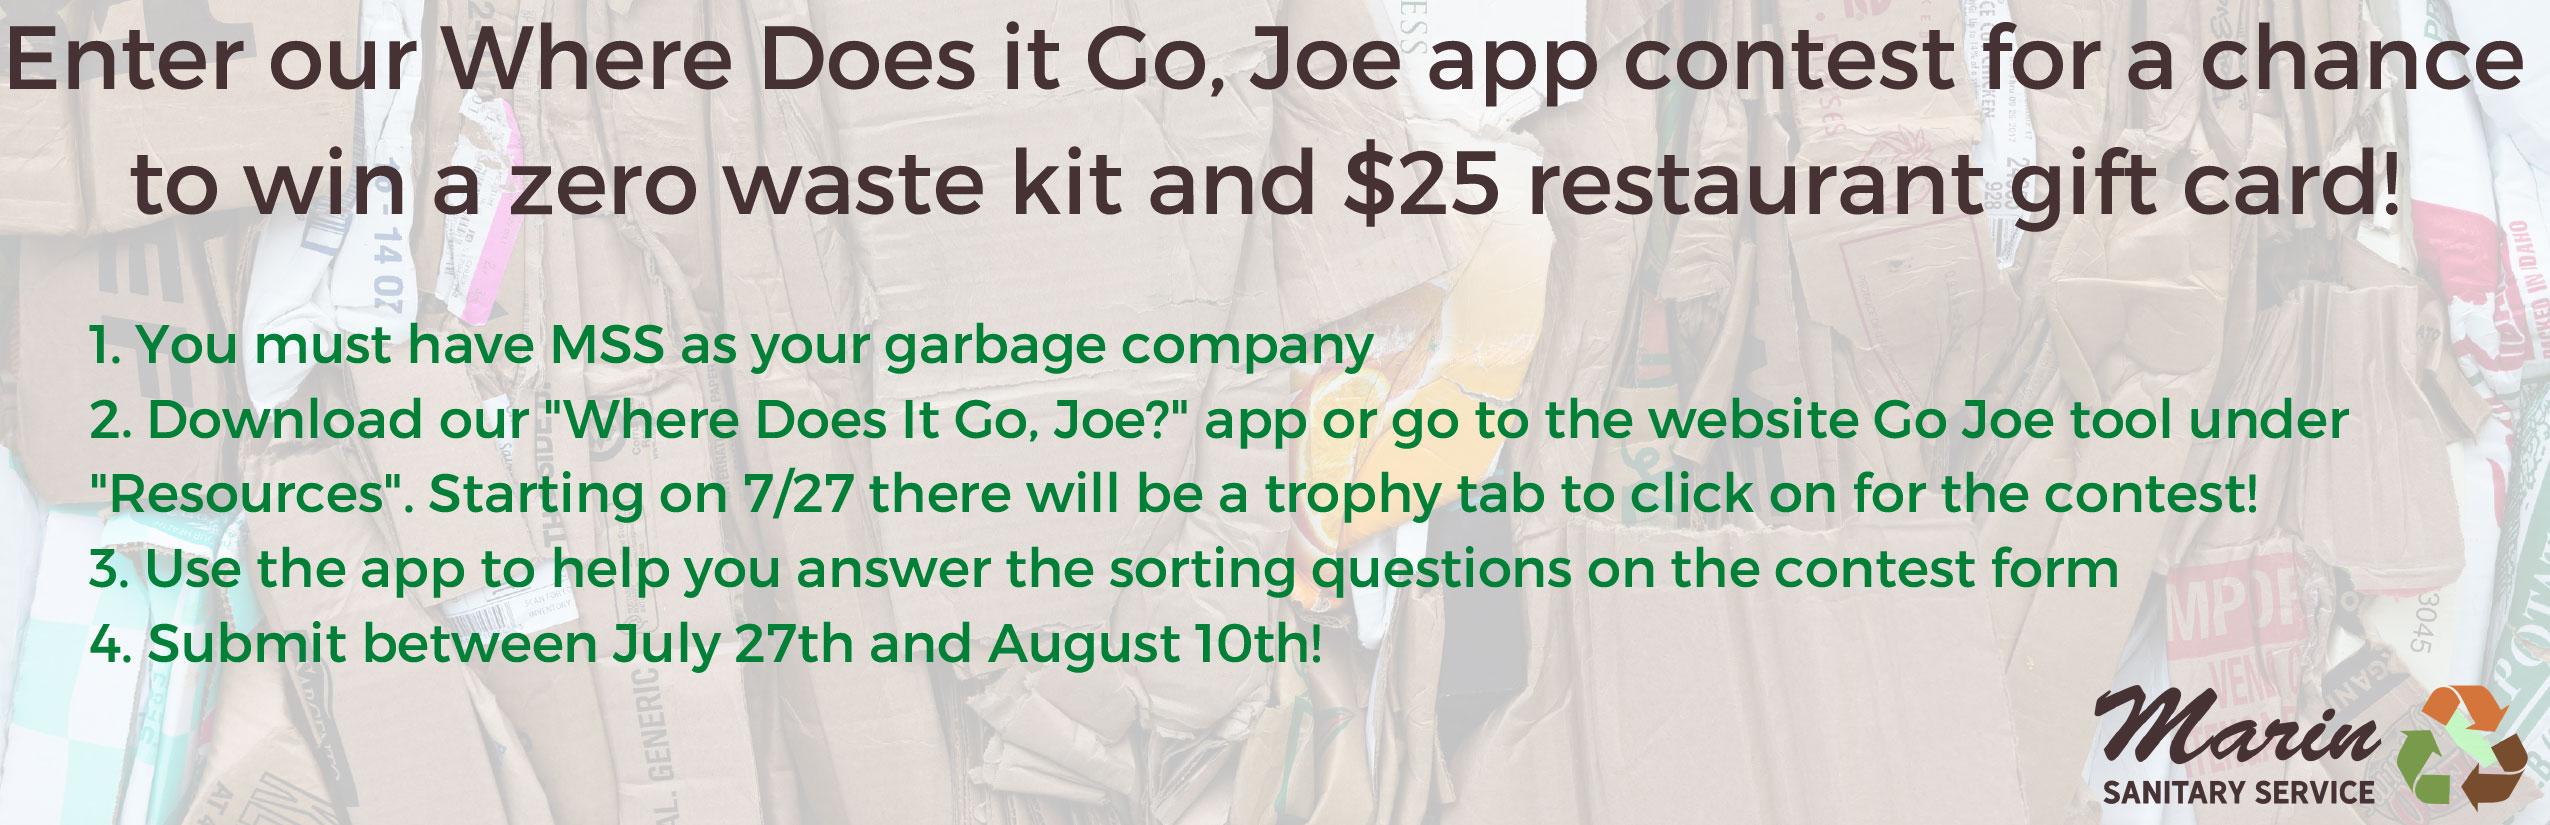 Where Does It Go, Joe Contest